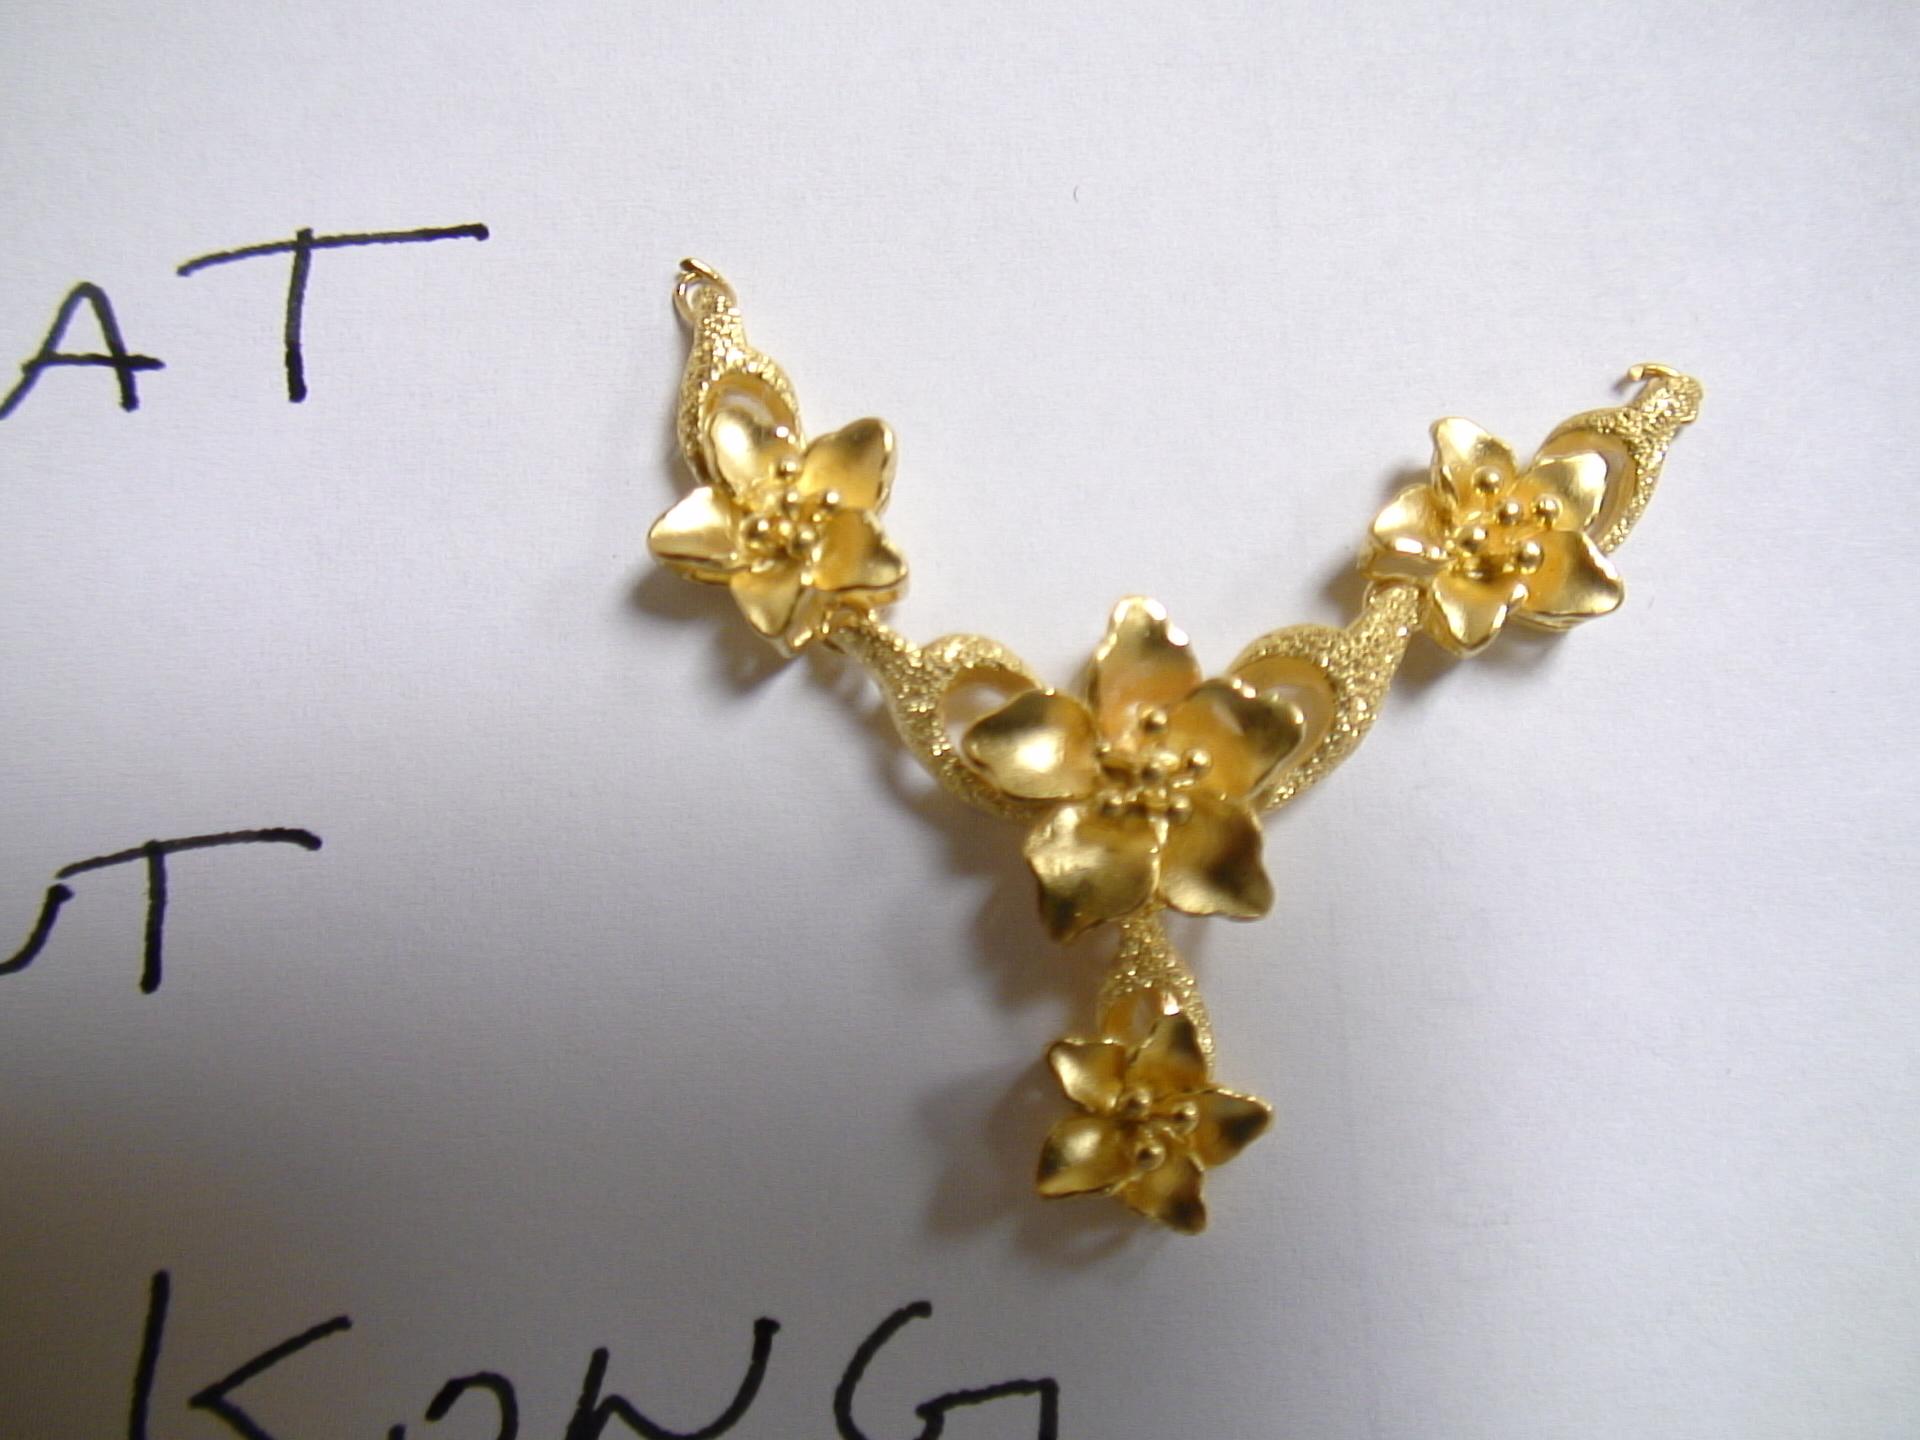 24 carat gold jewelry